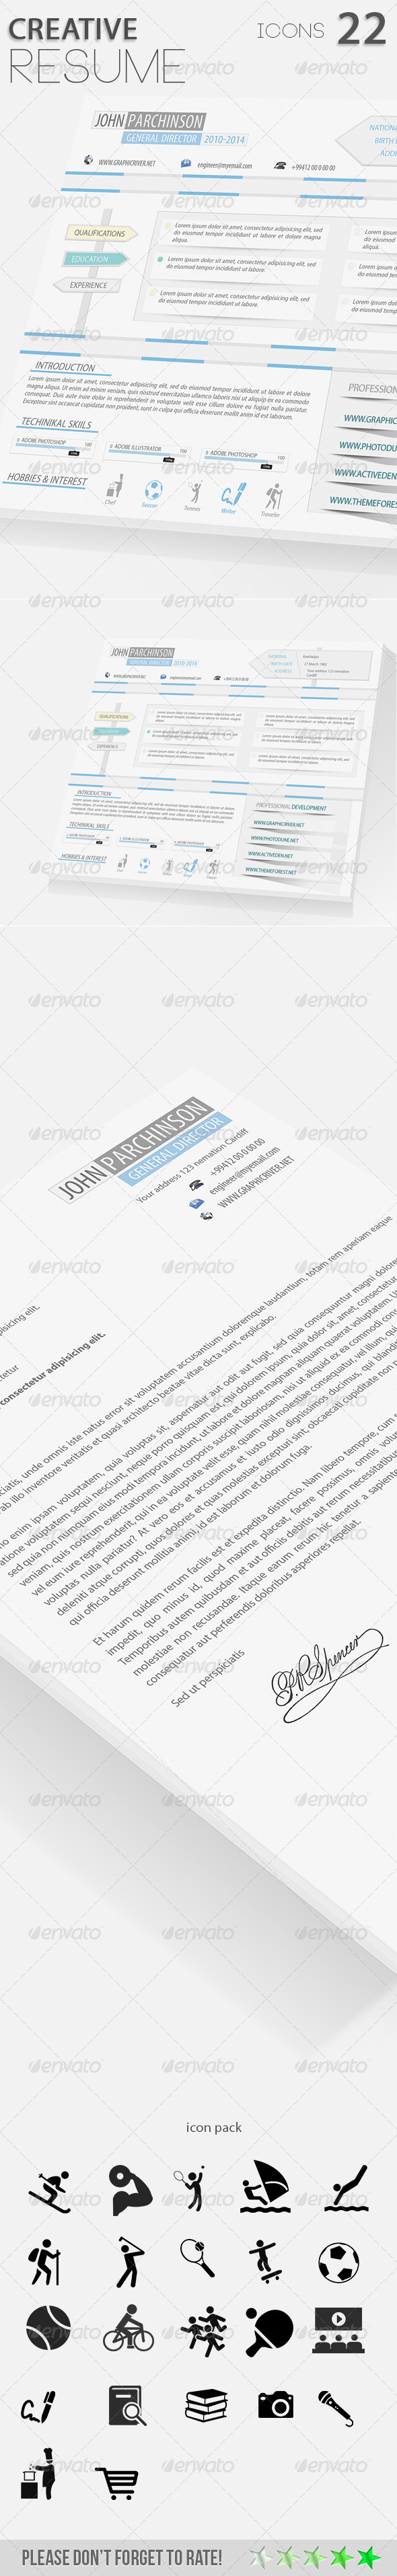 Creative Resume_01 - Resumes Stationery